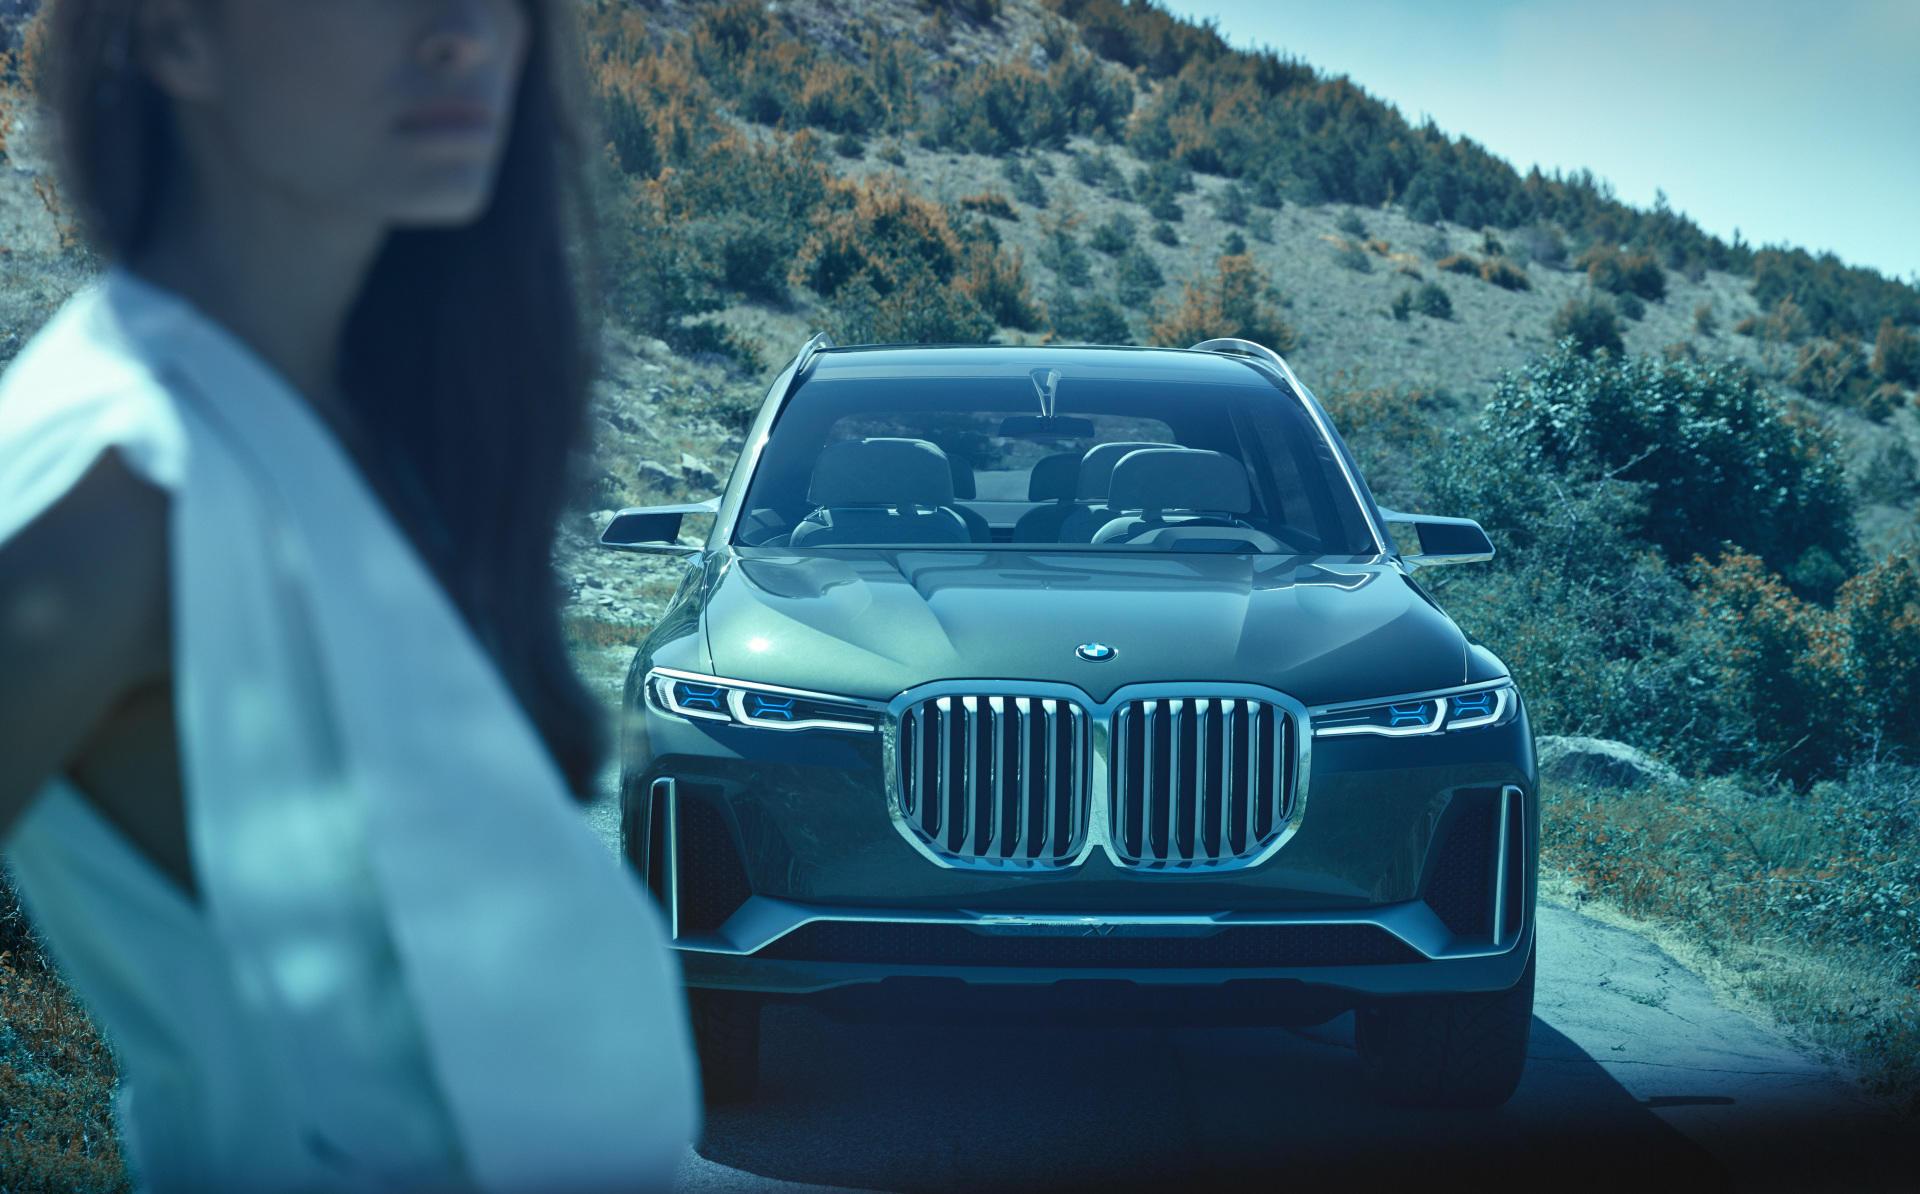 BMW-x7-concept-dm-11.jpg